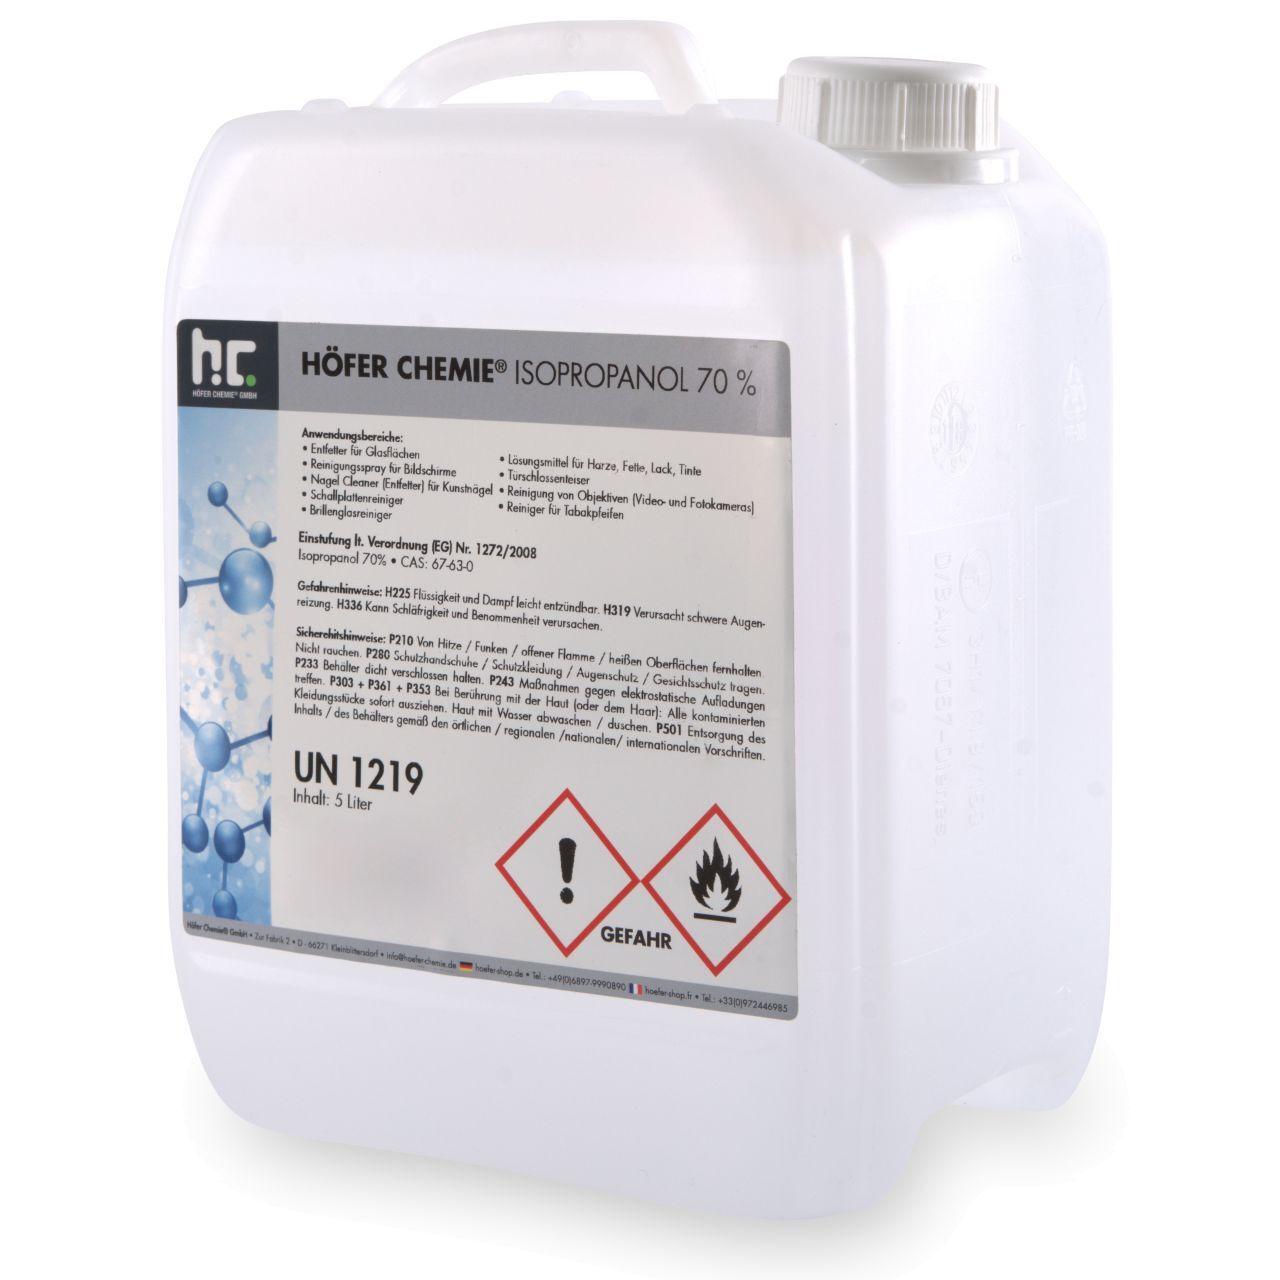 Höfer Chemie 20 l alcool isopropylique 70% (4 x 5 l)